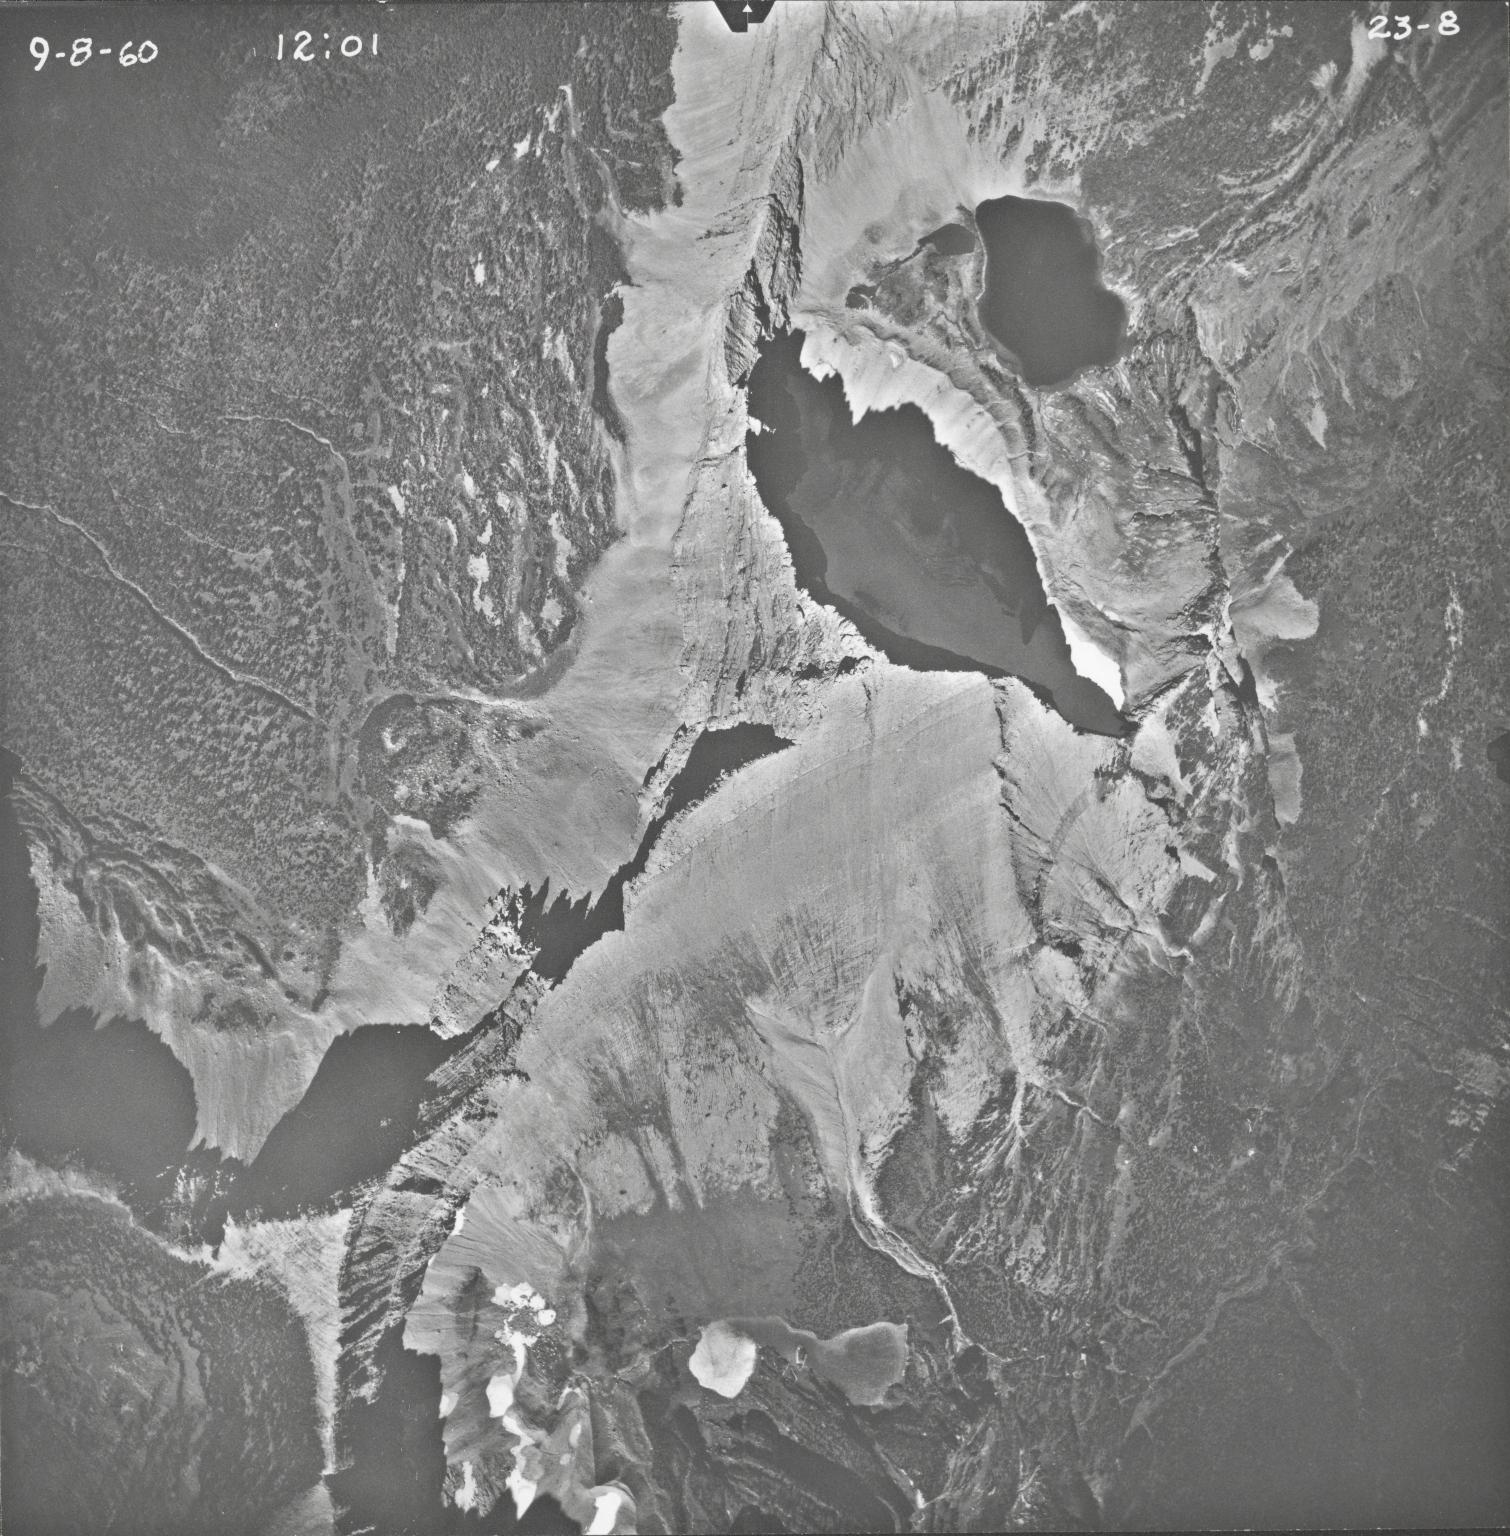 Split Mountain, aerial photograph 23-8, Montana